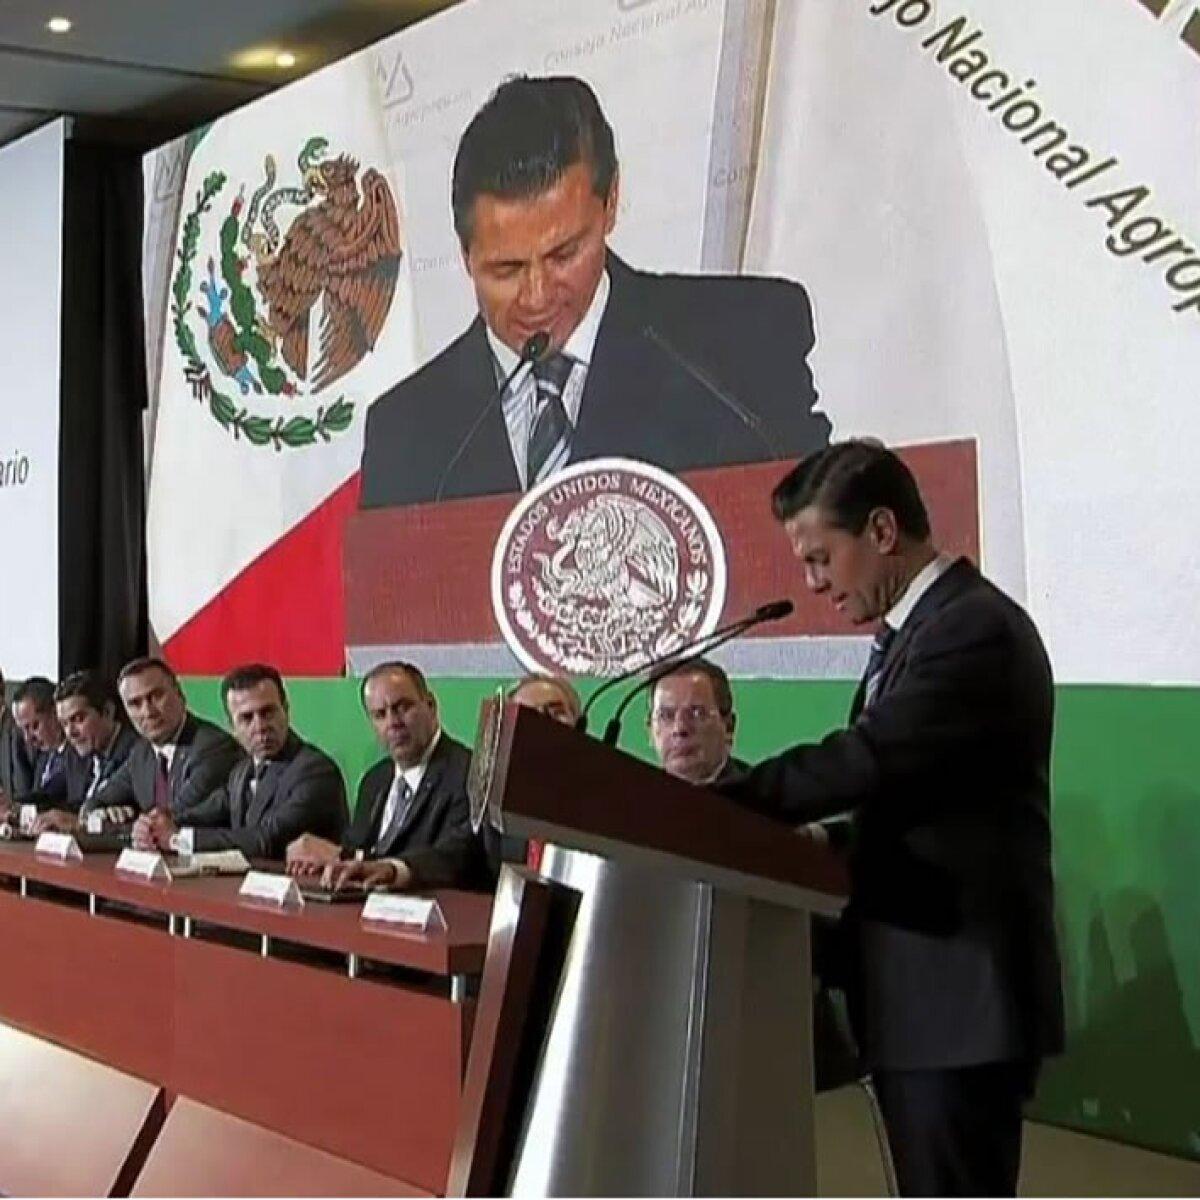 En negociación del TLCAN, Peña exigirá respeto para México